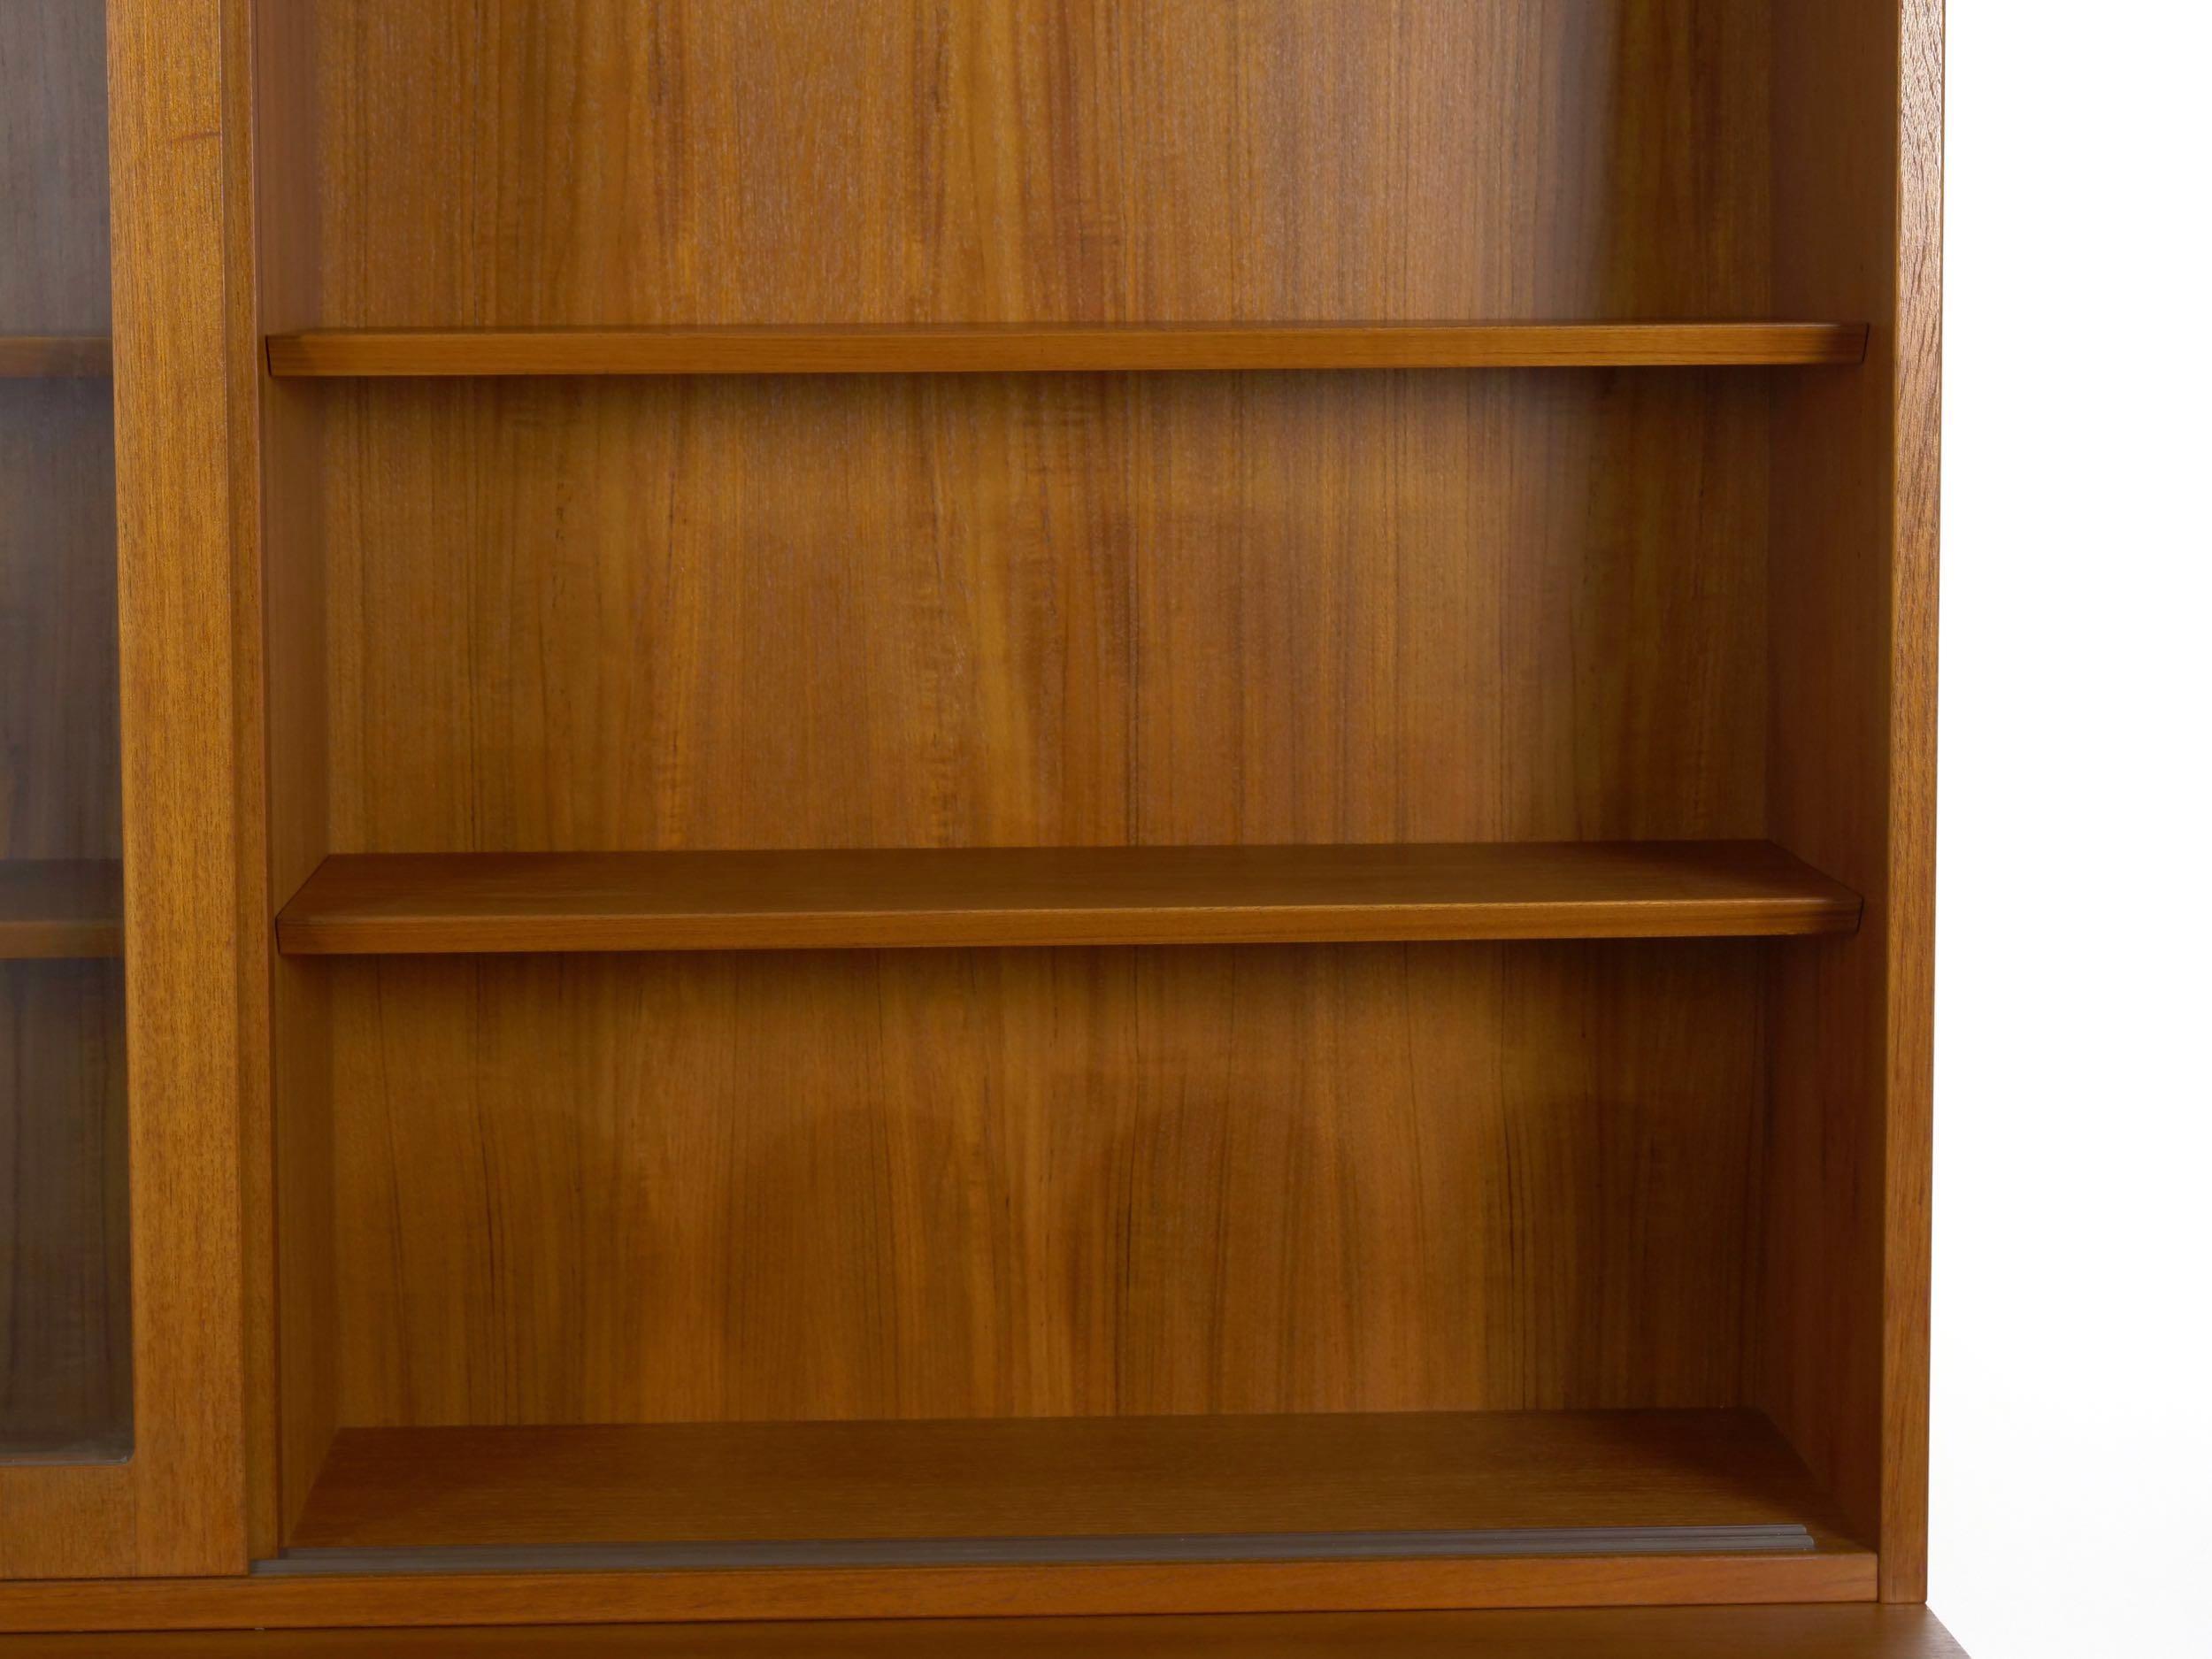 Danish Mid Century Modern Teak Bookcase Bookshelf Cabinet By Poul Hundevad